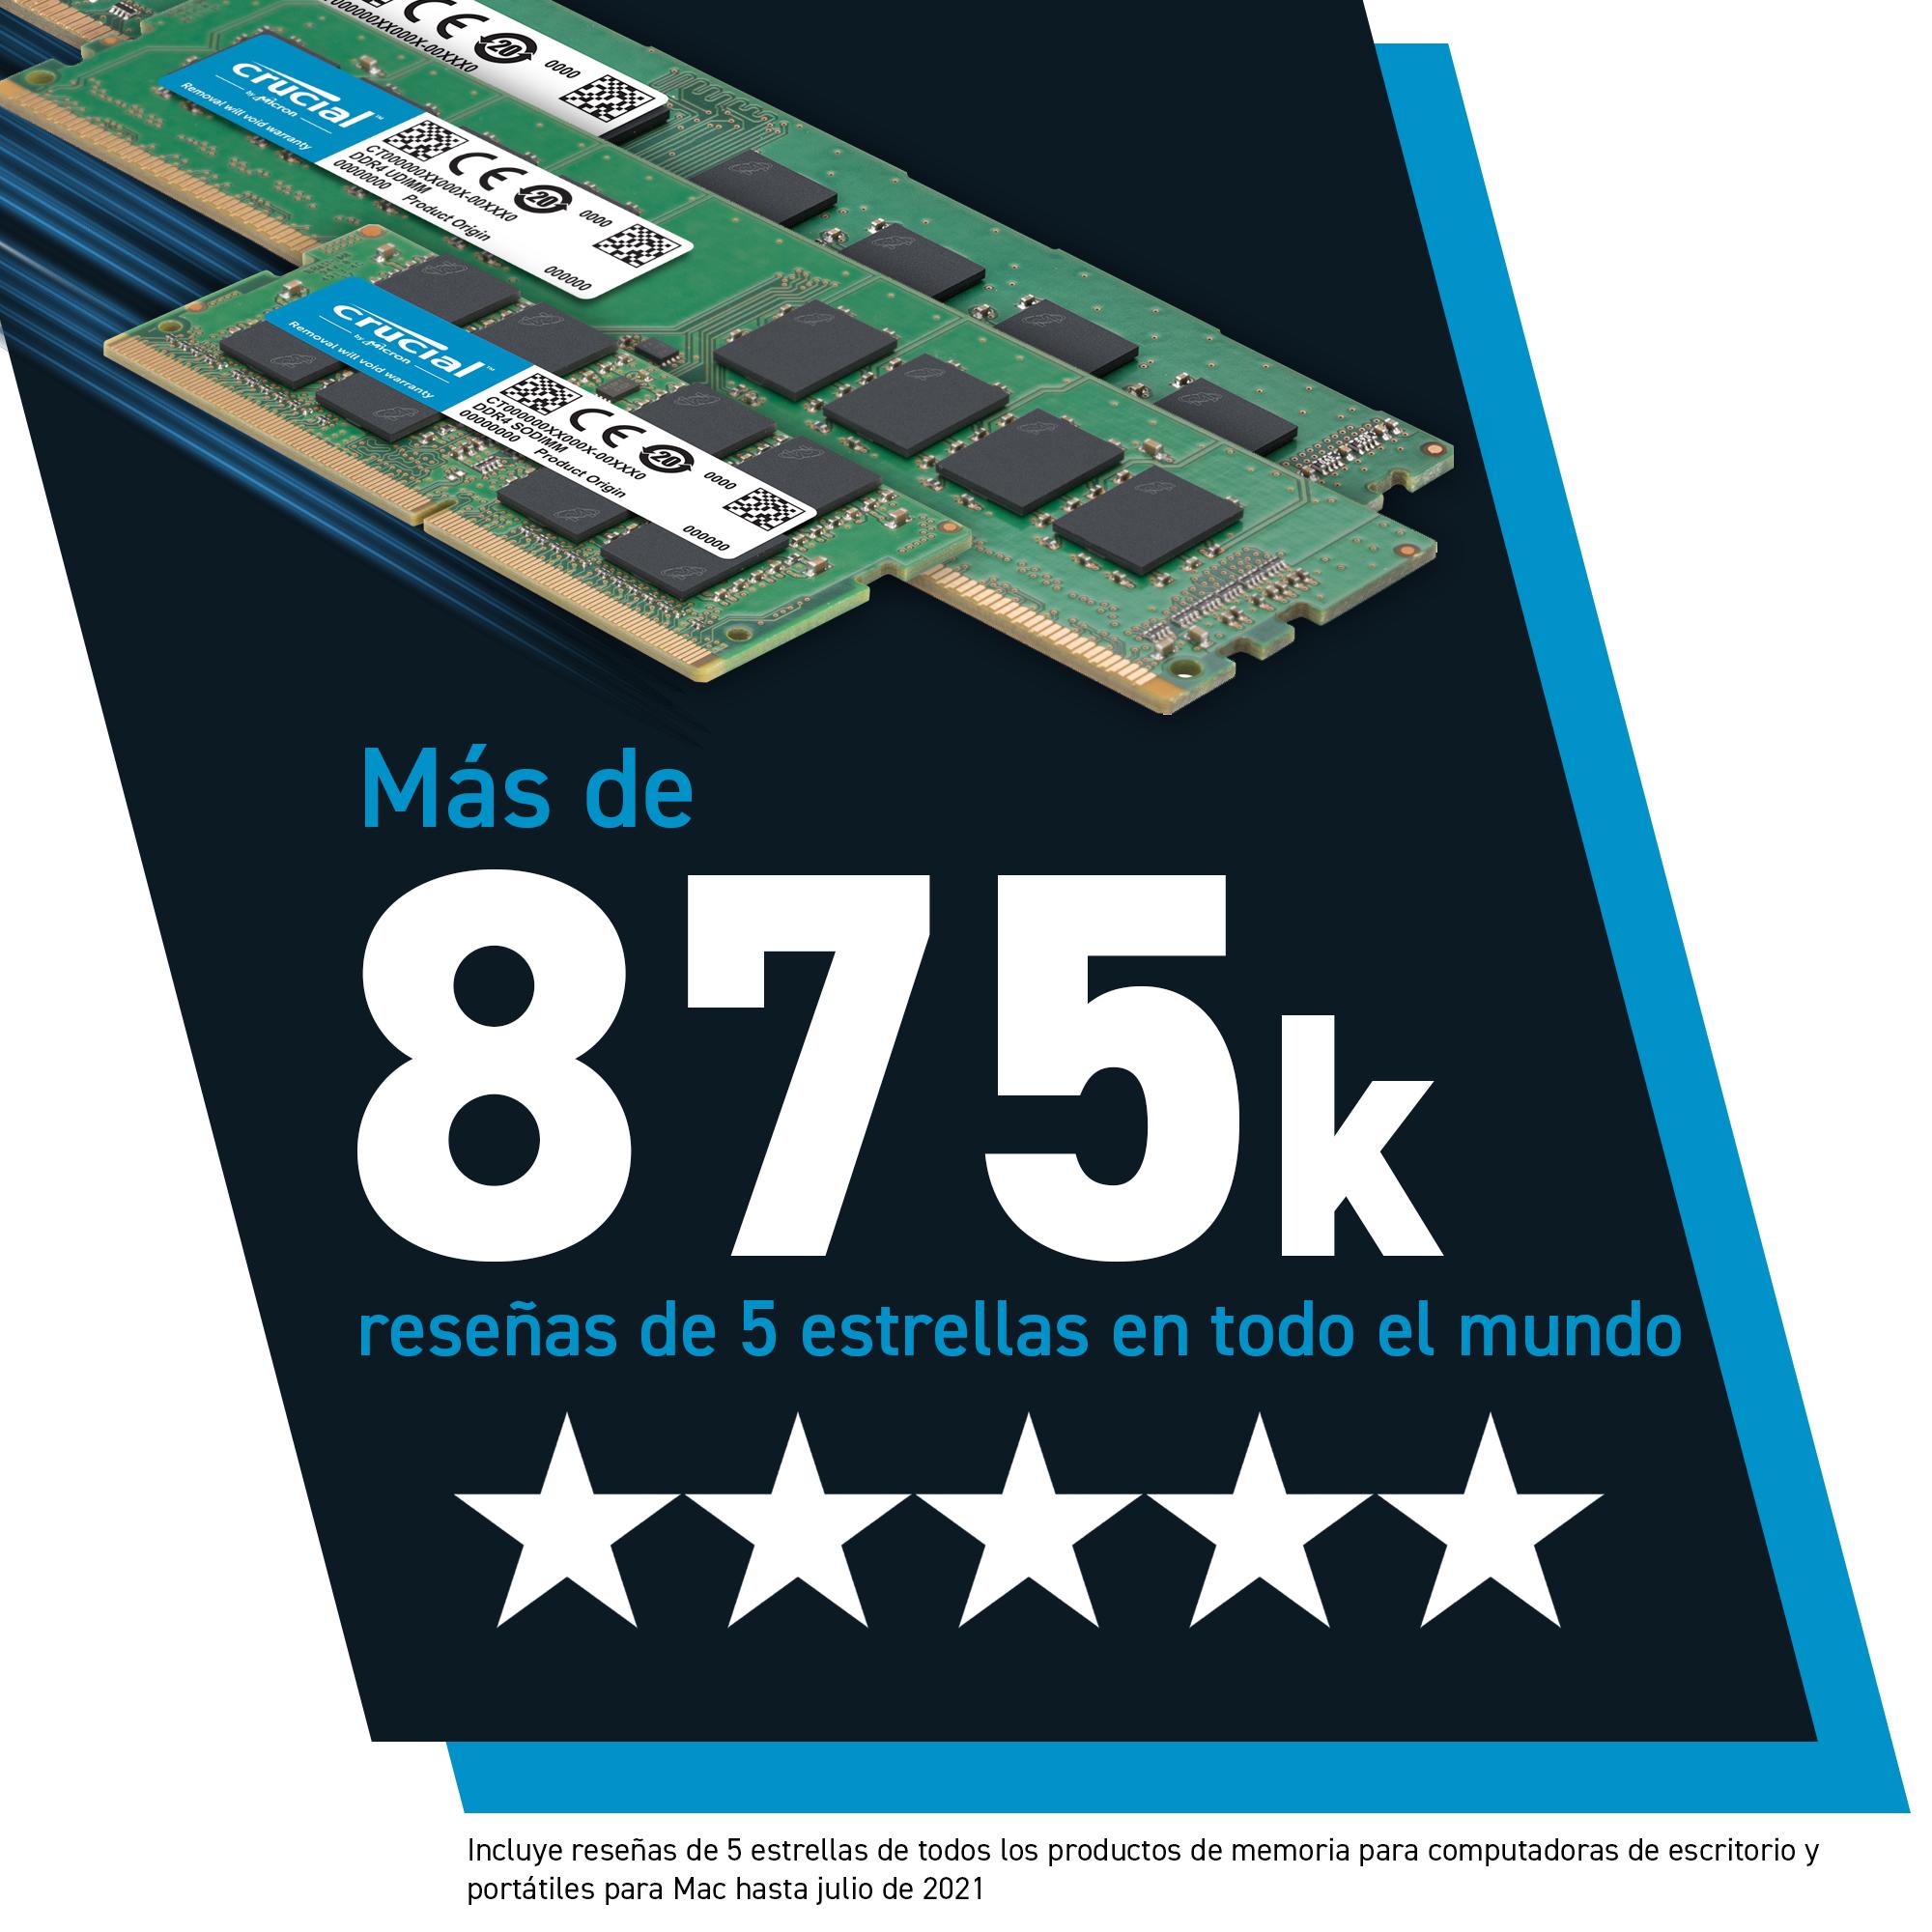 Crucial 16GB DDR4-2666 UDIMM- view 2